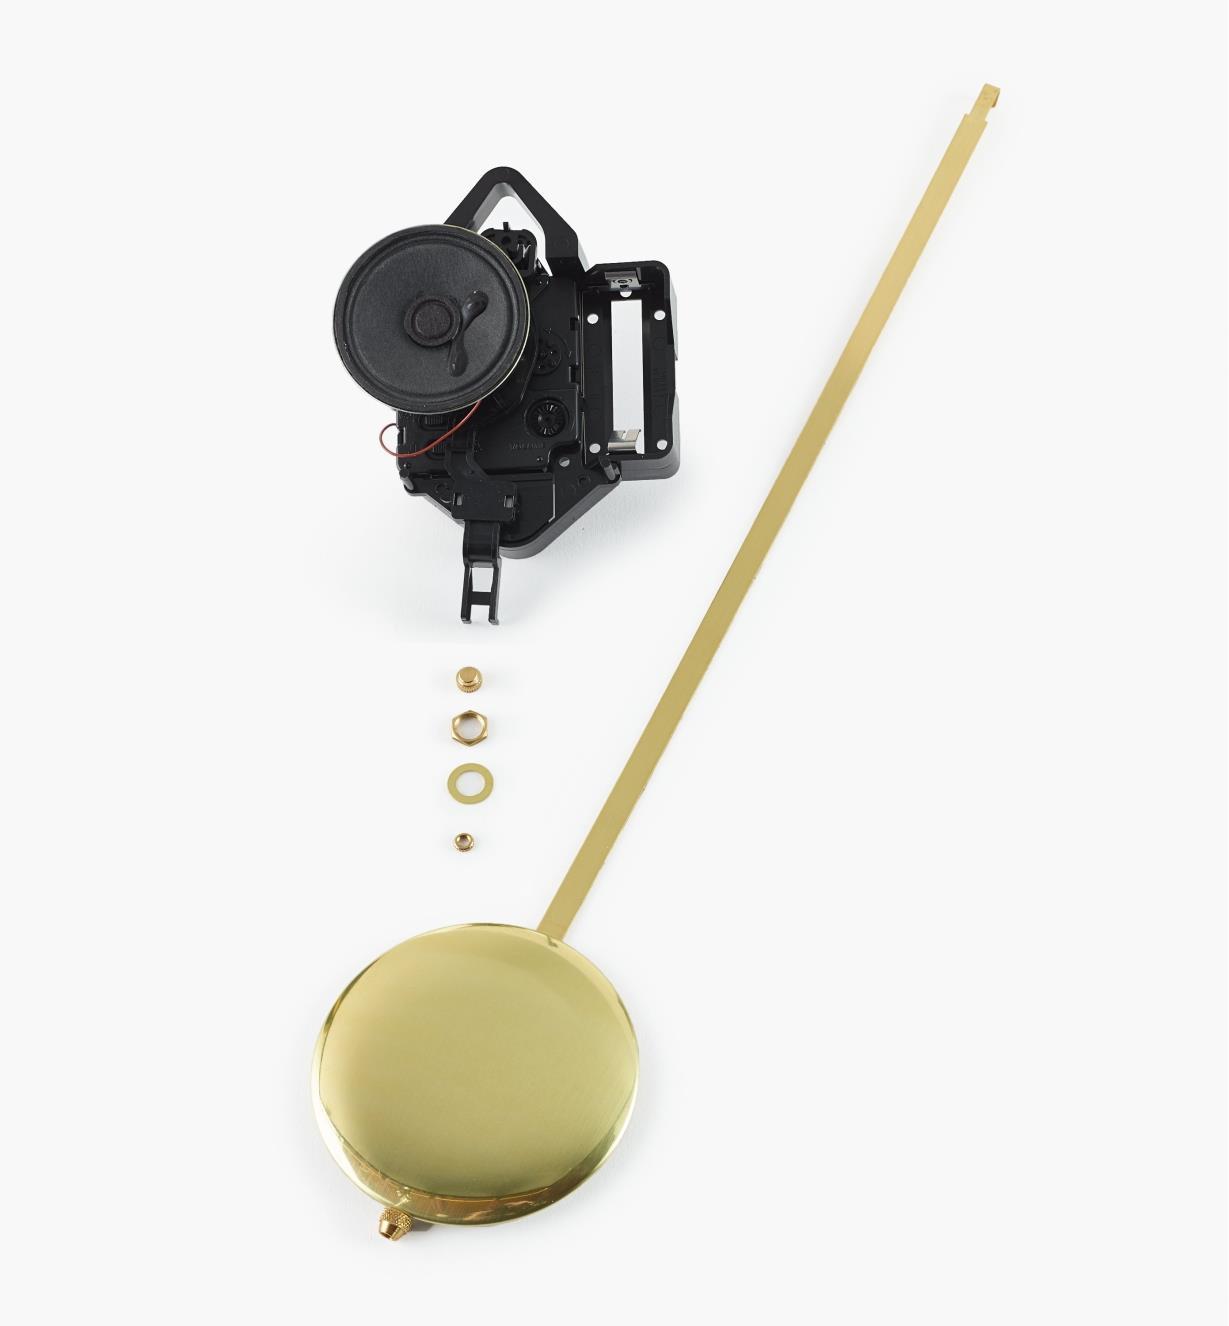 46K0133 - Pendulum Chime